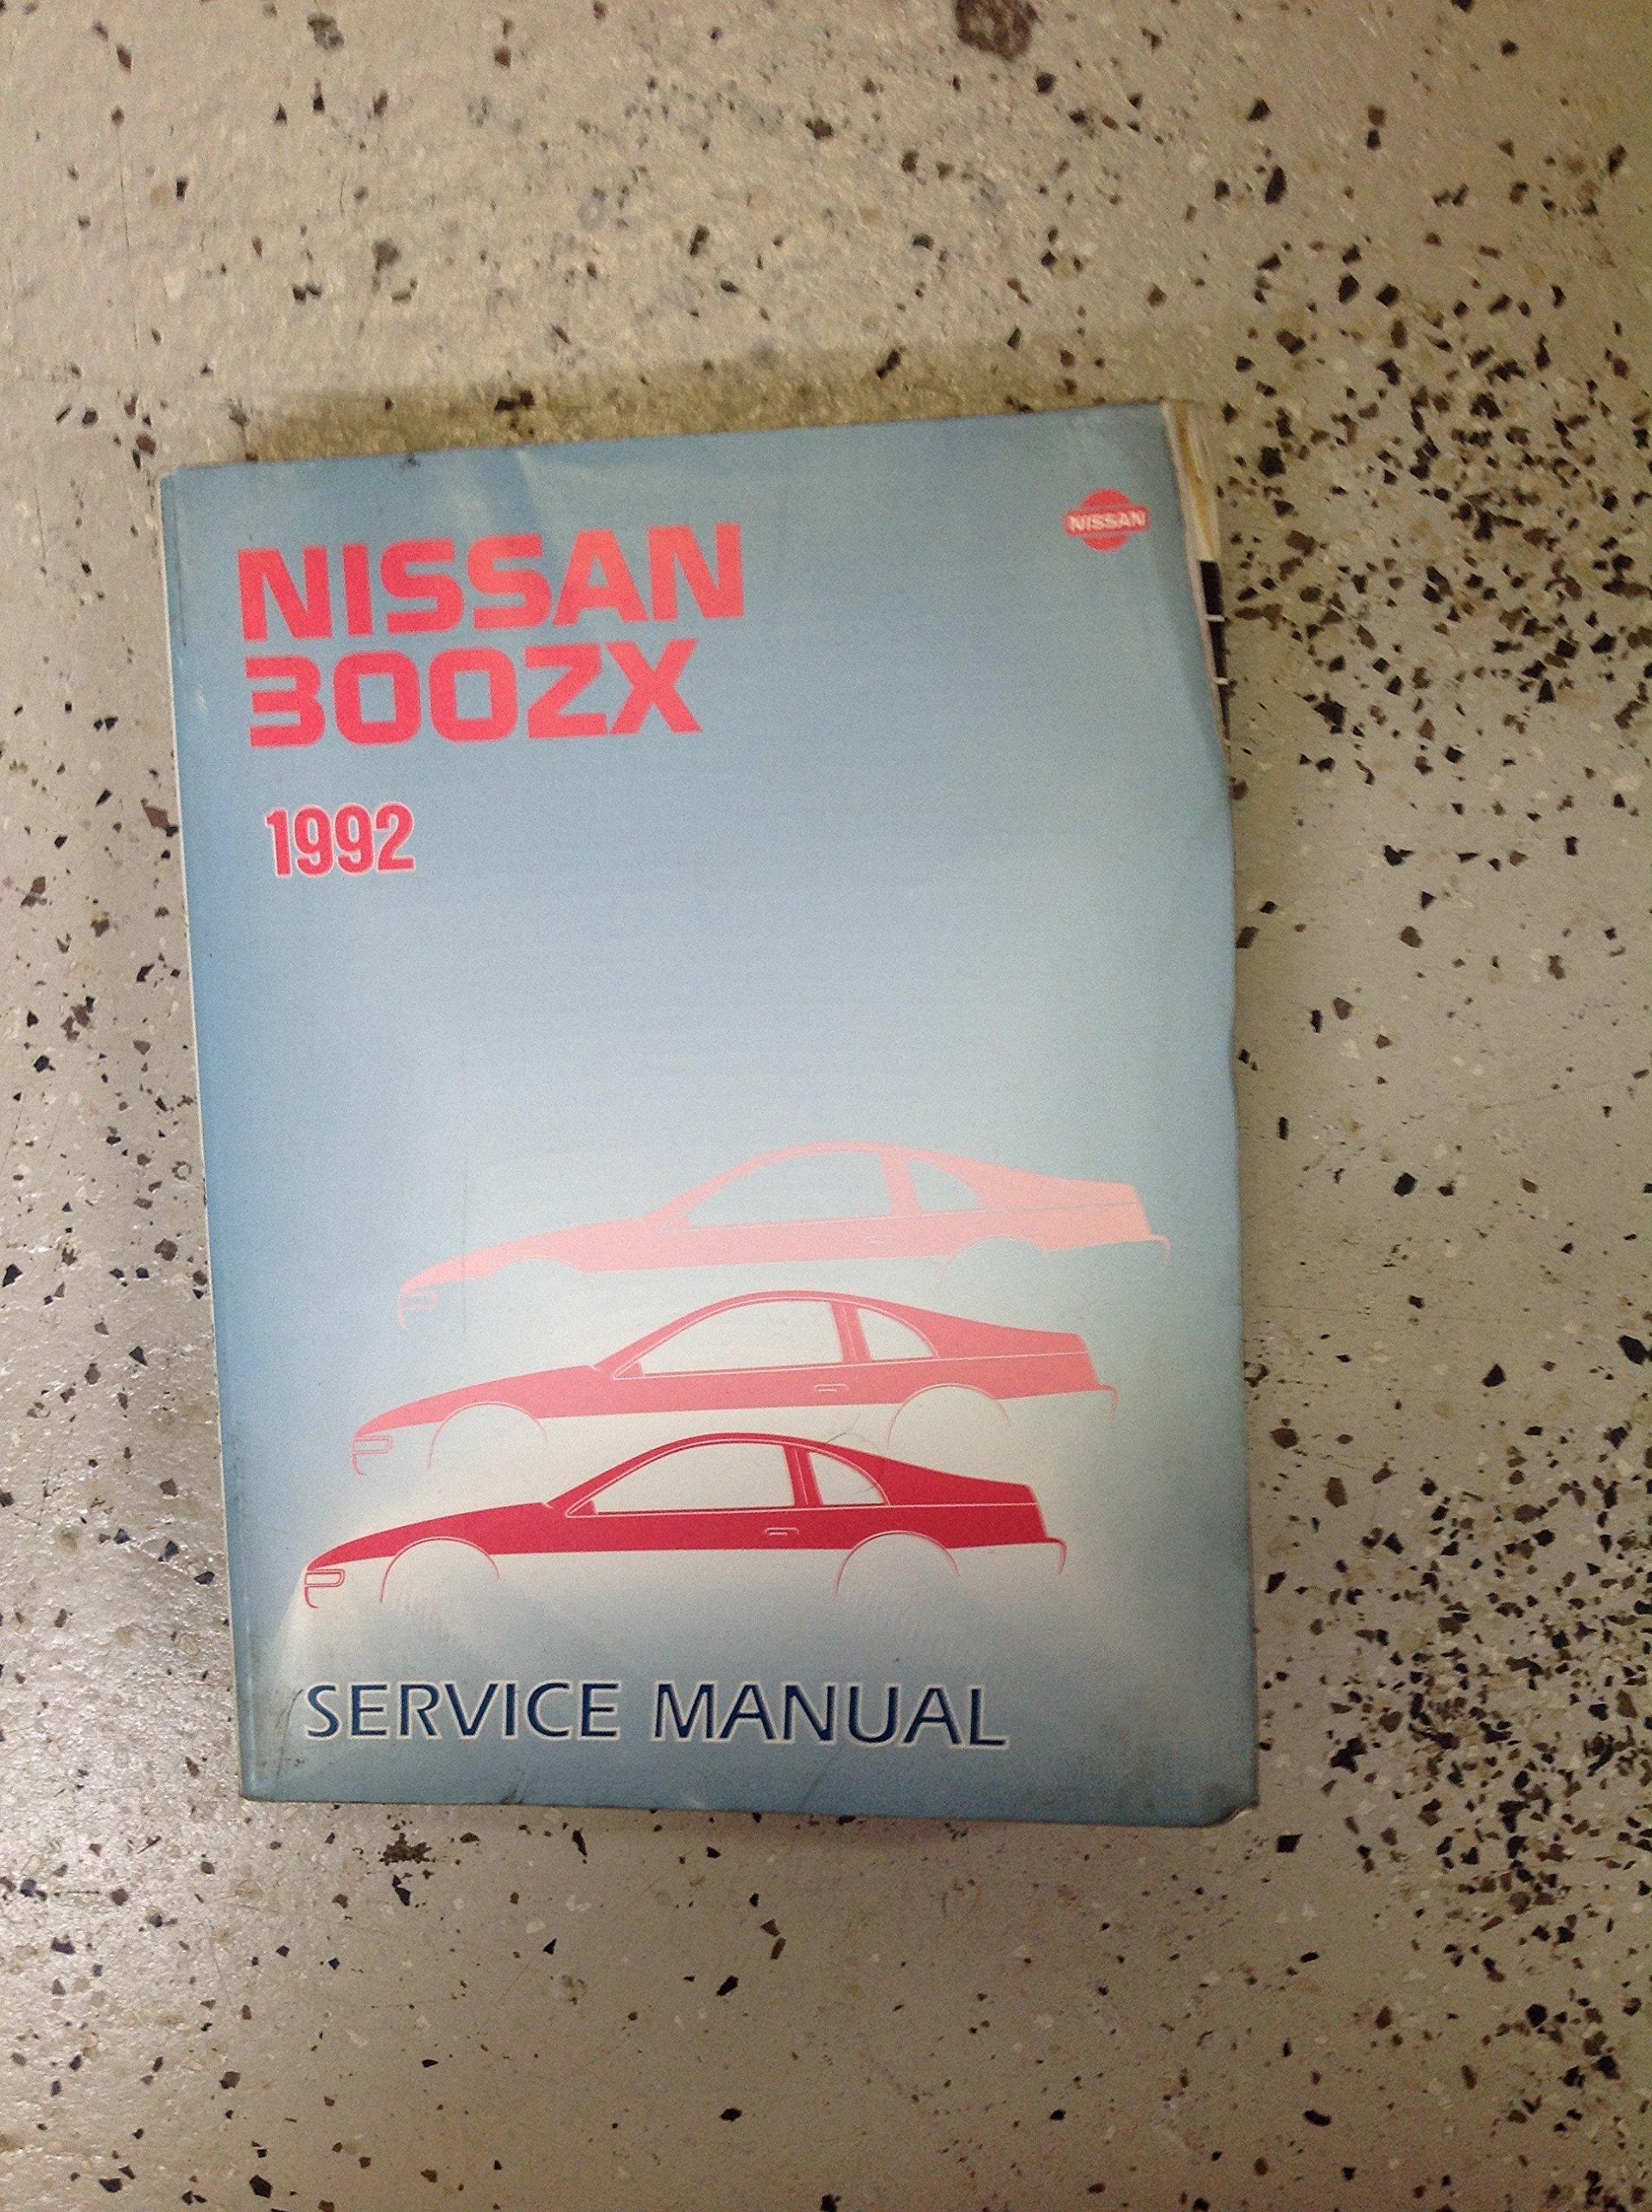 1992 Nissan 300ZX Repair Shop Manual Original: Nissan